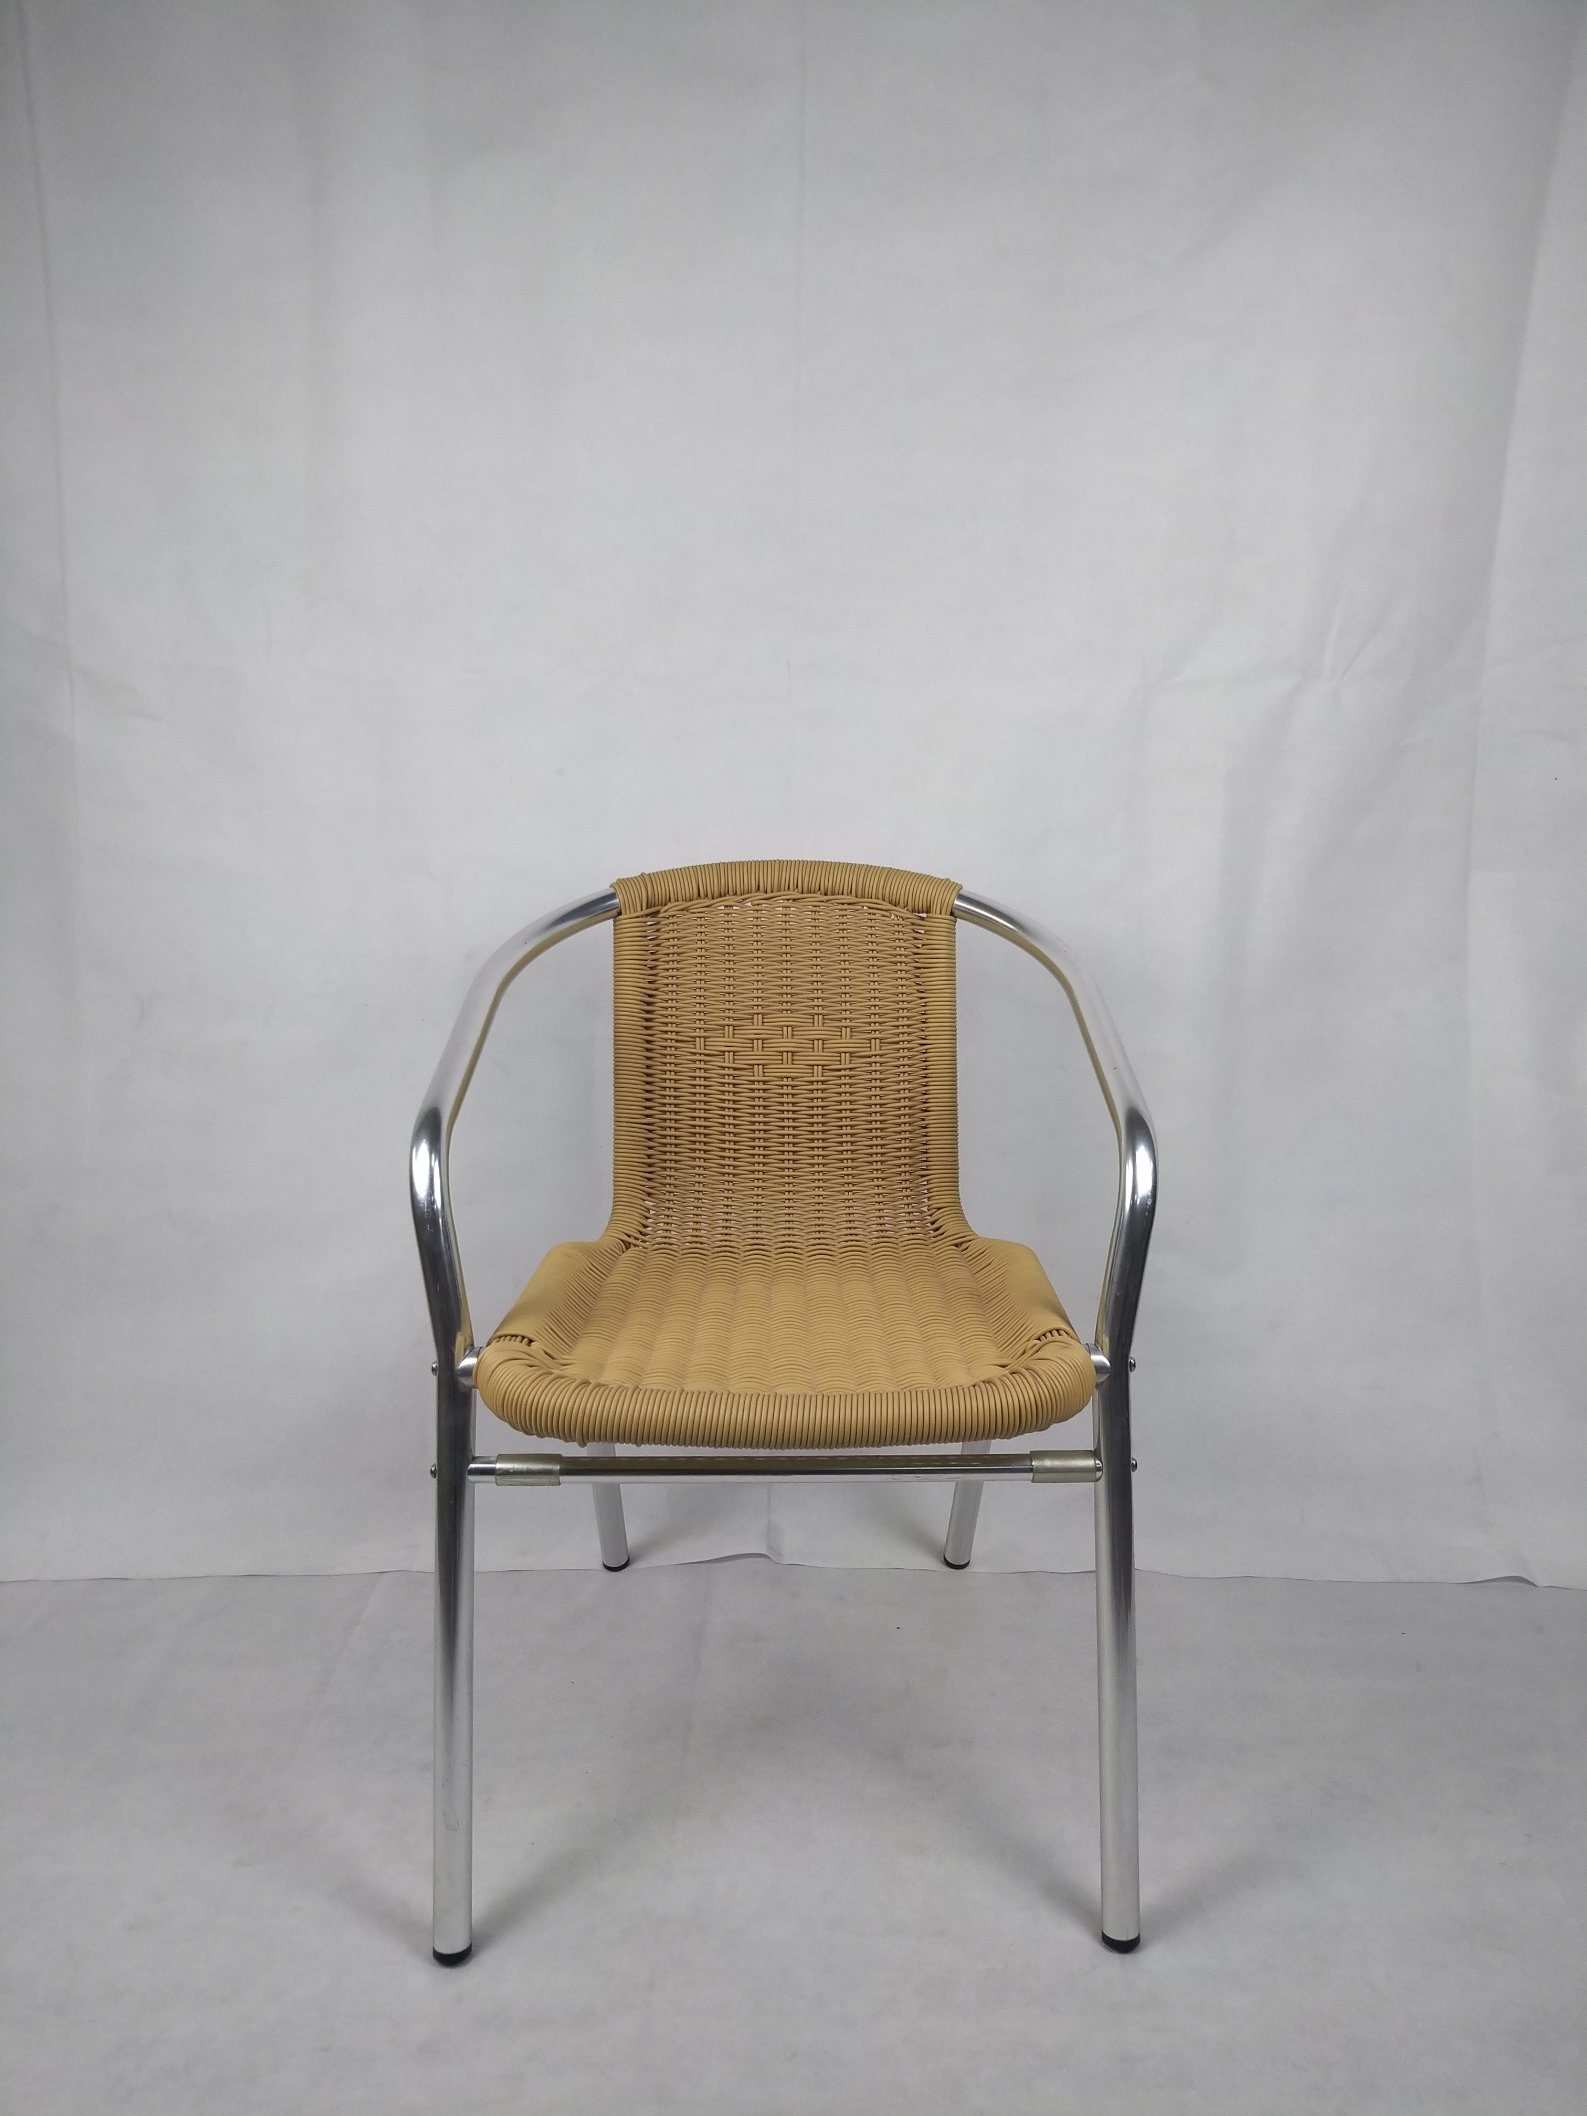 [Hot Item] Commercial Outdoor Bistro Restaurant Chair Aluminium Slat Heavy  Duty Garden Chair Furniture